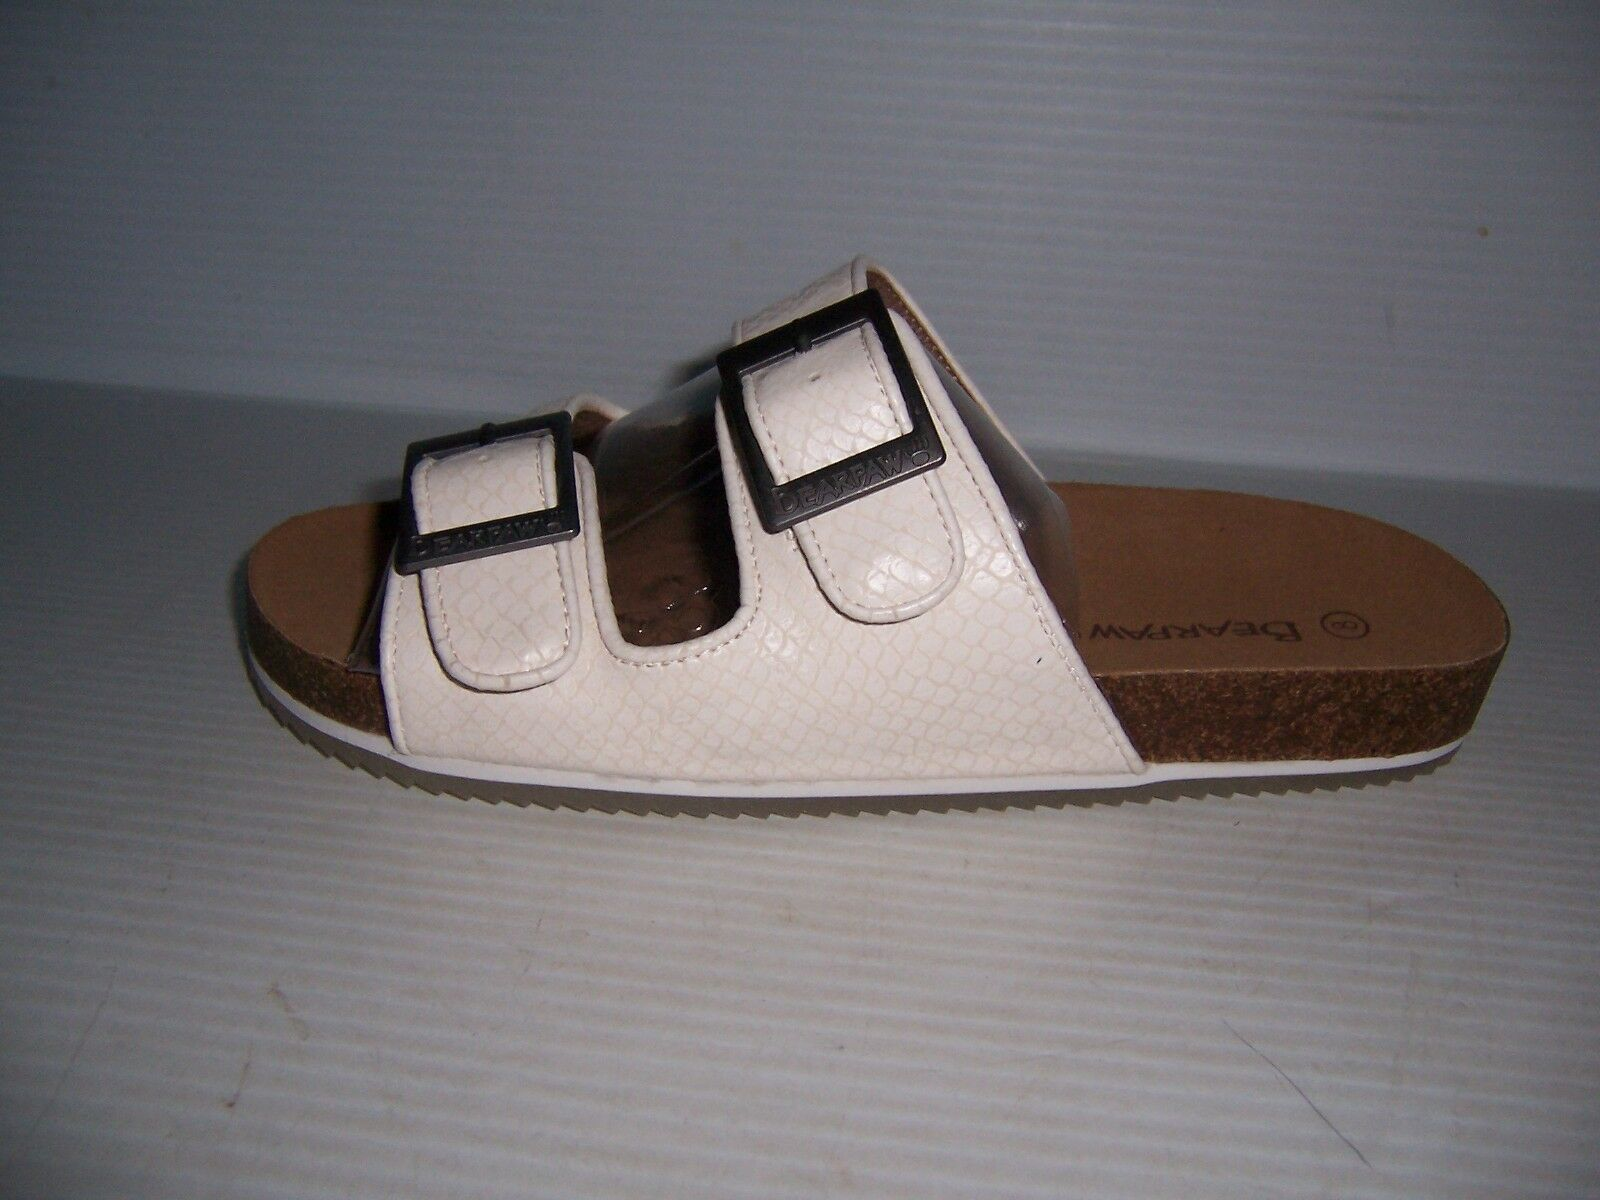 Bearpaw Brooklyn White Snake 8 Women's Microsuede Slides Sandals Size 8 Snake NEW e58a62